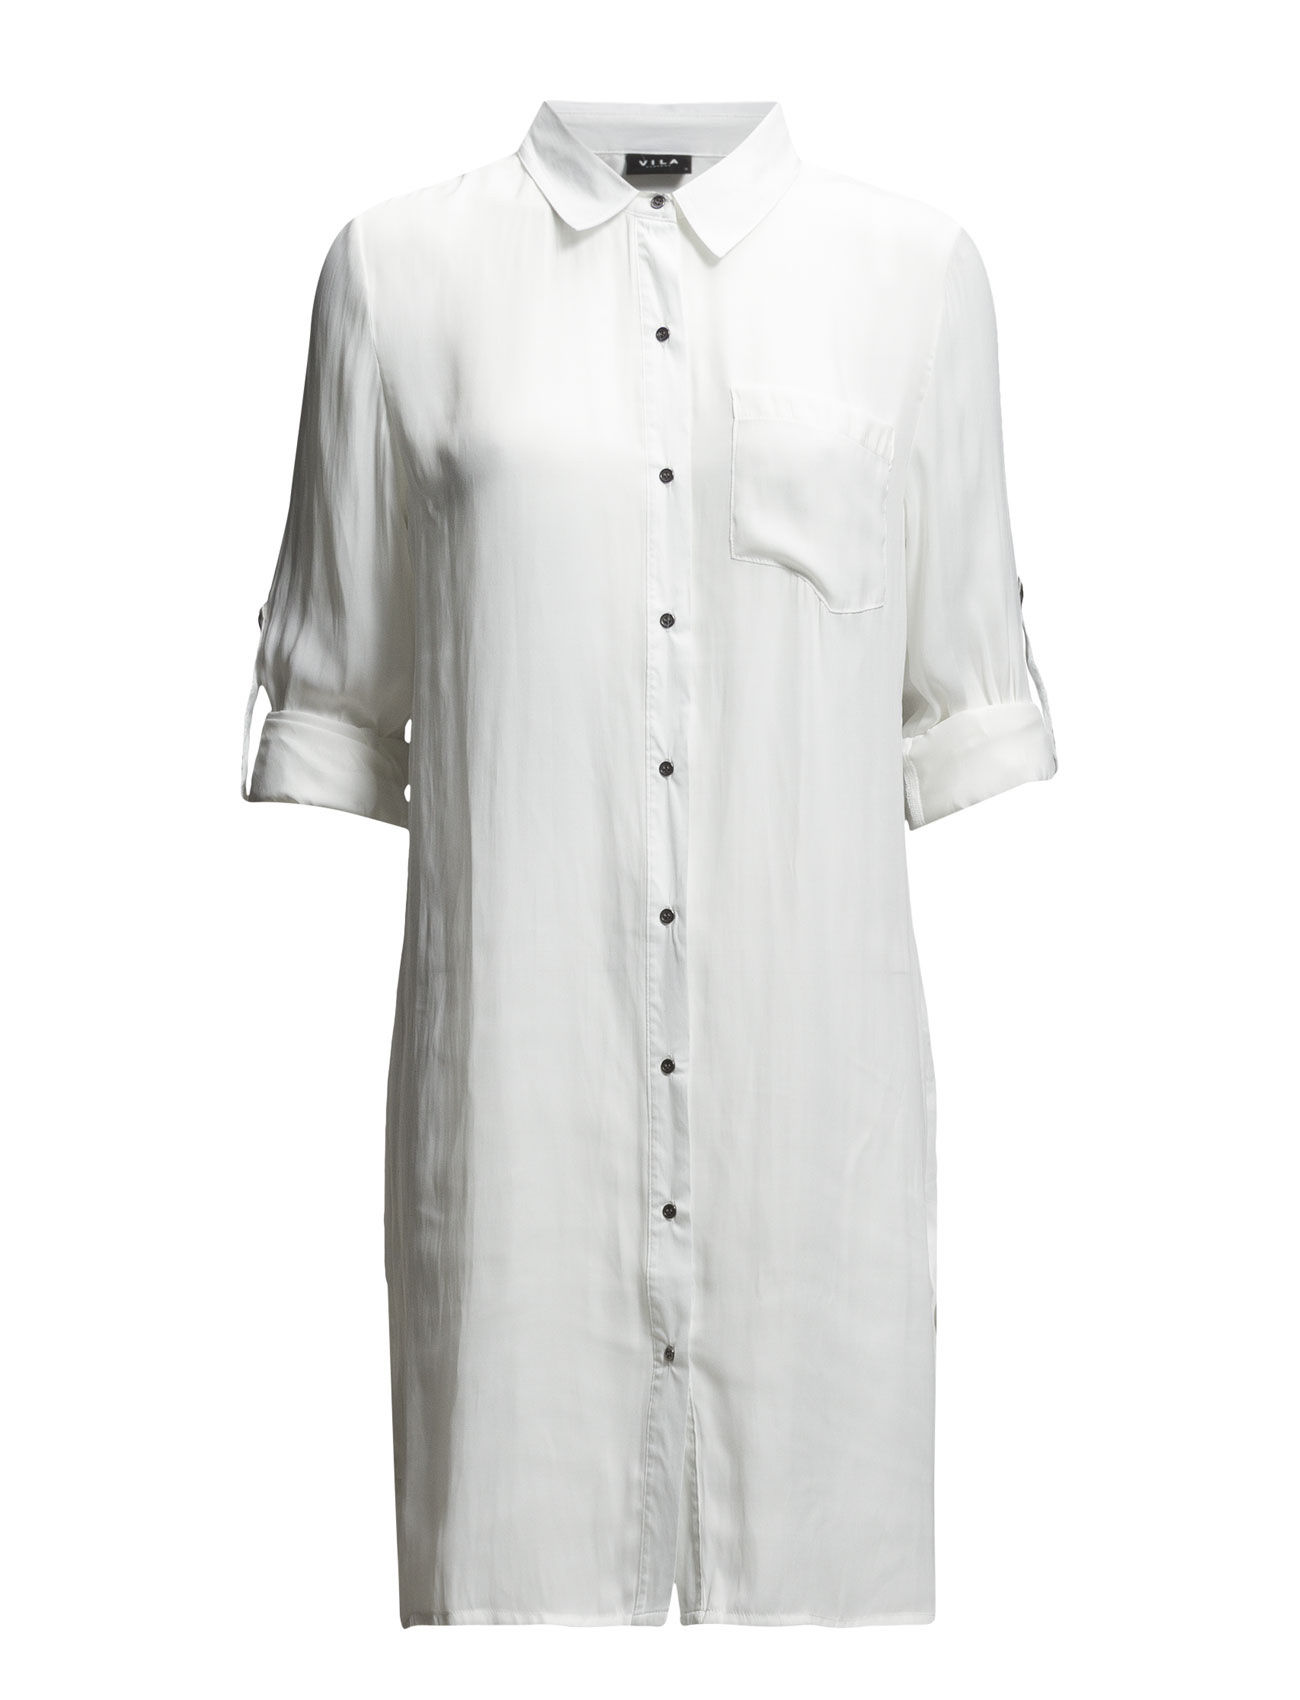 Vigriaz Long Shirt